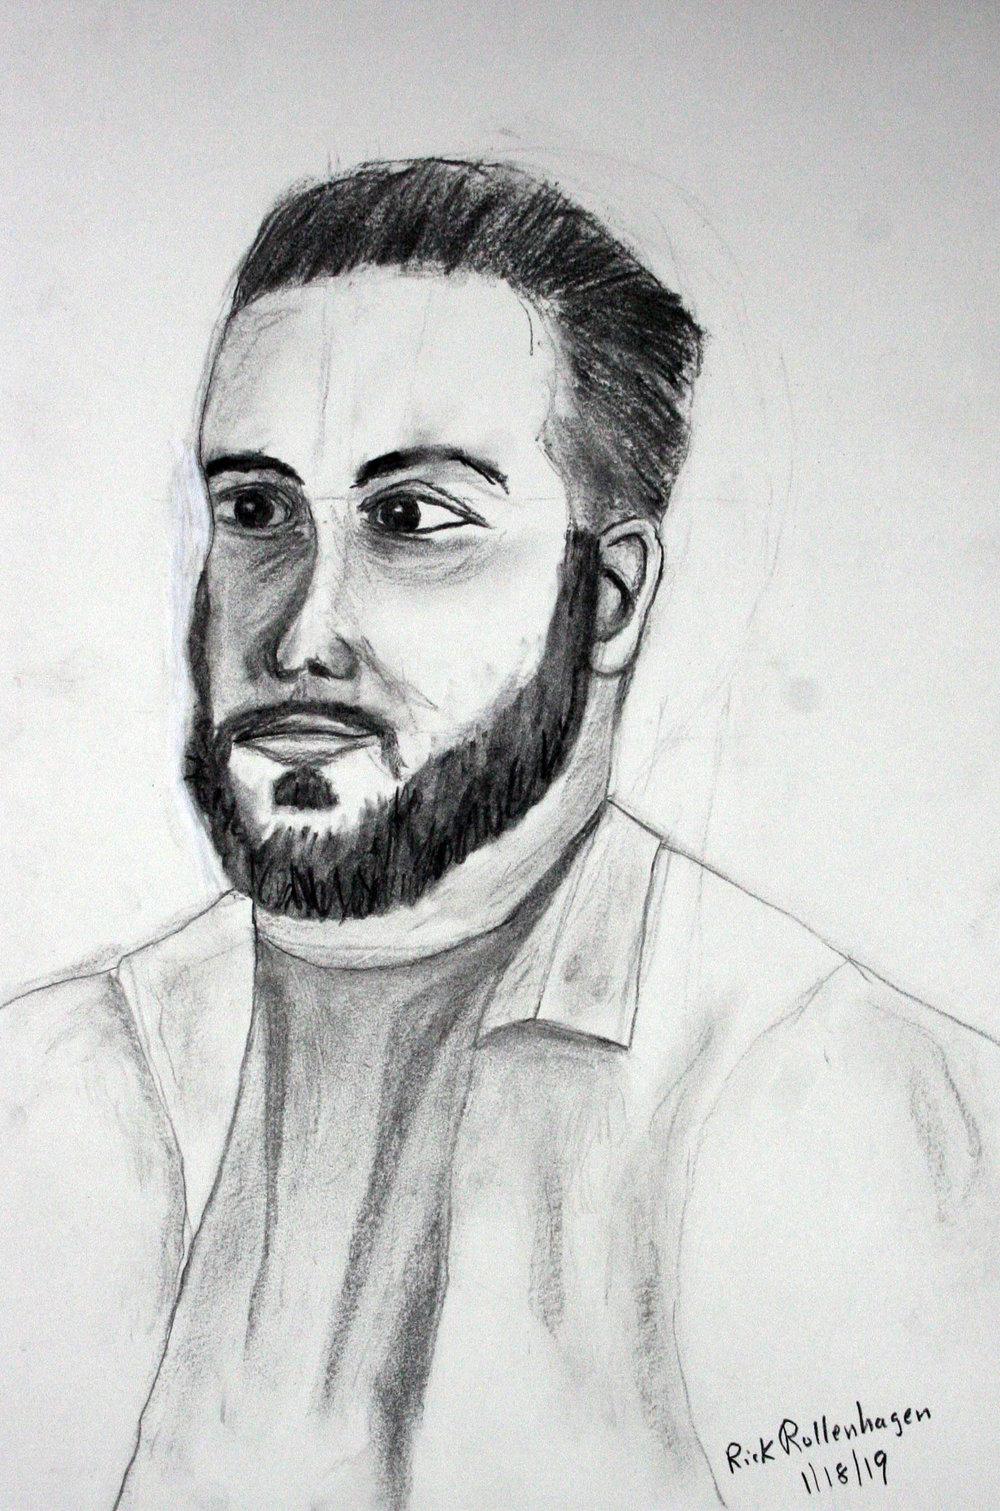 Rick Rollenhagen did this drawing.